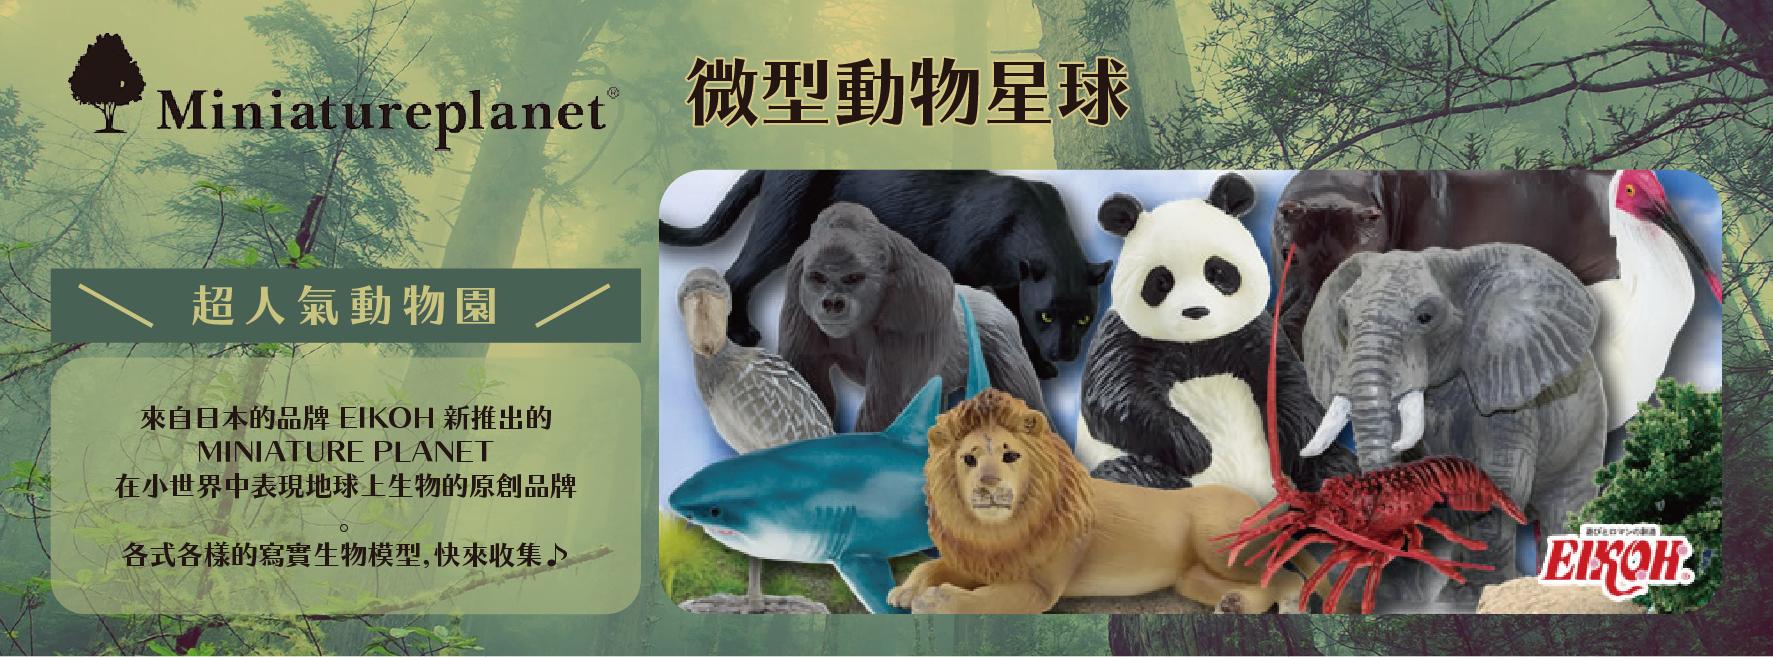 ●EIKOH動物模型 - HobbyToy 哈玩具